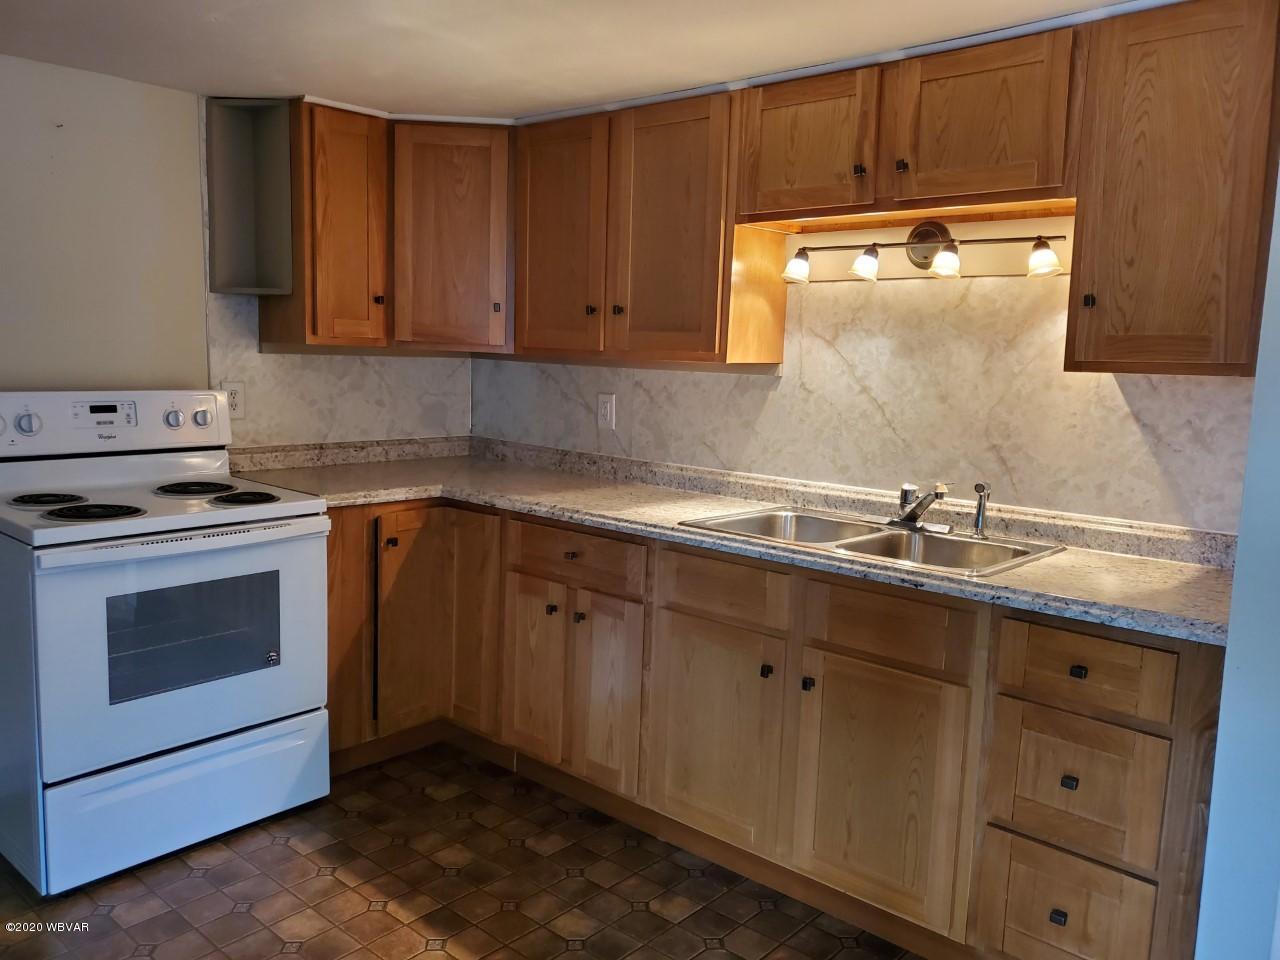 1911 LYCOMING CREEK ROAD, Williamsport, PA 17701, 1 Bedroom Bedrooms, ,1 BathroomBathrooms,Resid-lease/rental,For sale,LYCOMING CREEK,WB-89598